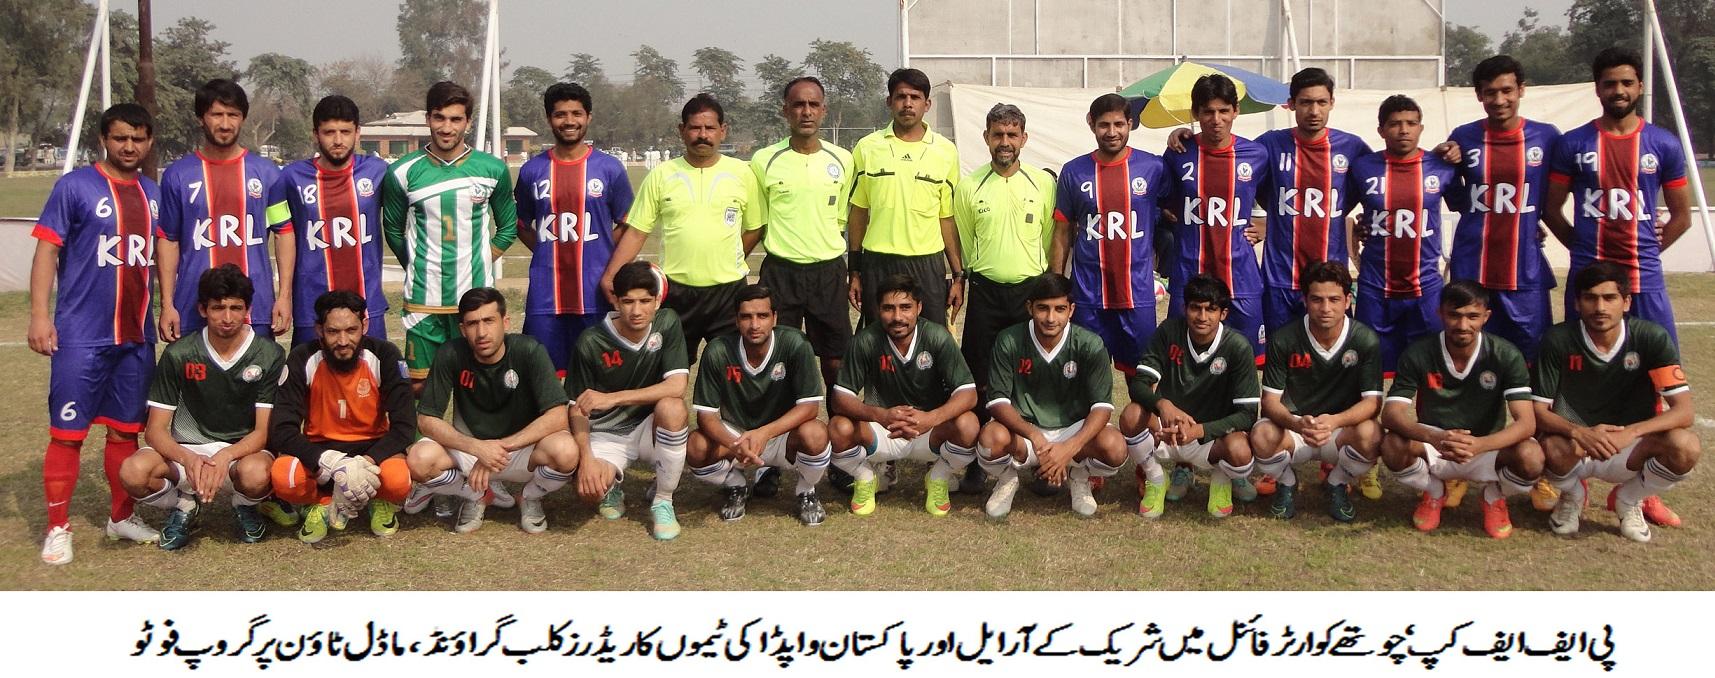 KRL hammer Wapda to reach PFF Cup semis [Dawn]